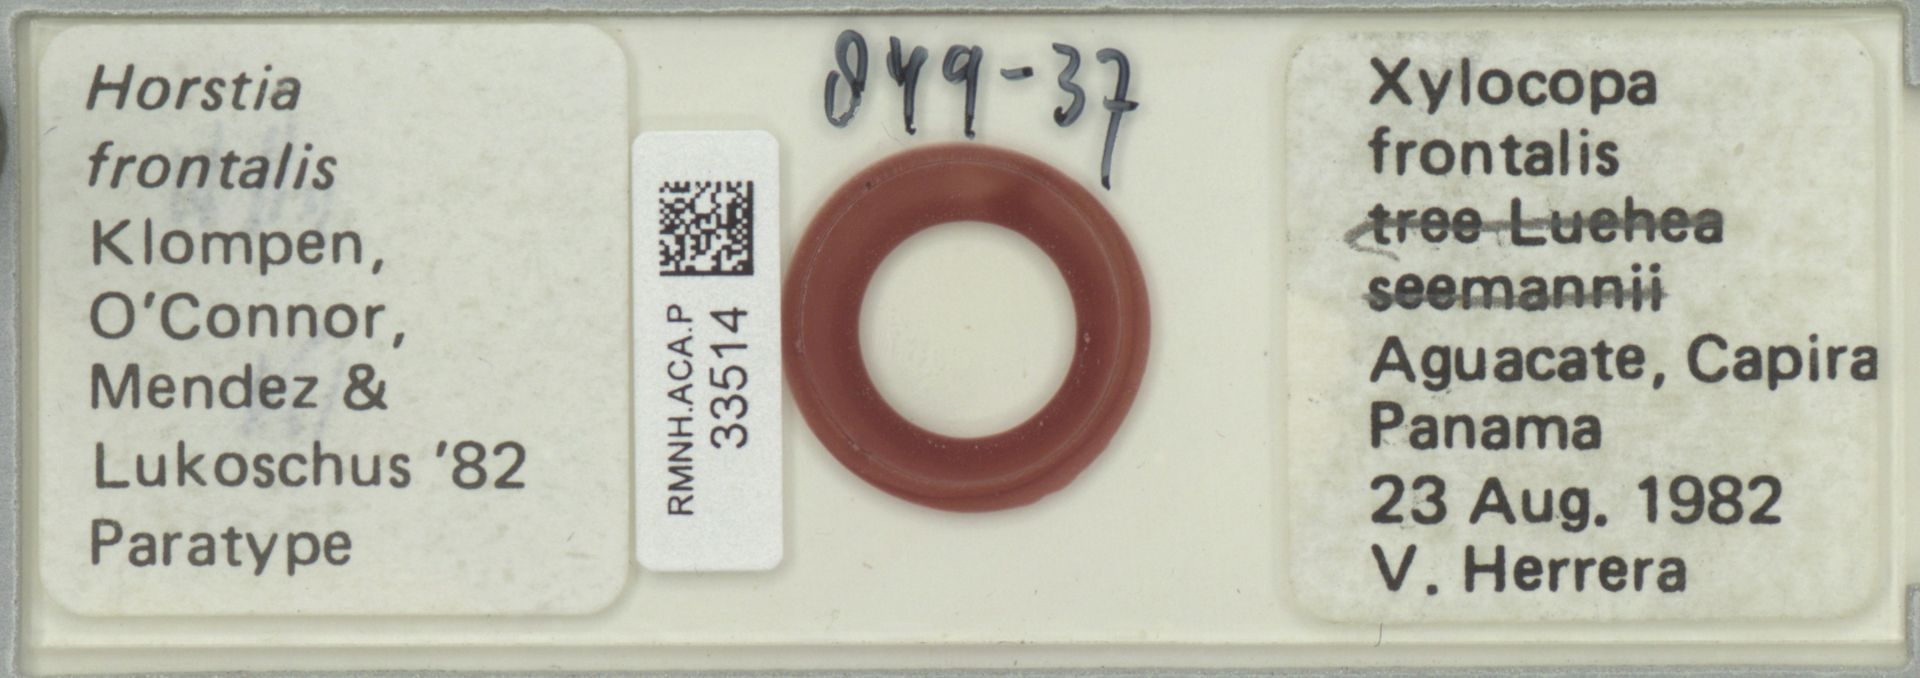 RMNH.ACA.P.33514 | Horstia frontalis Klompen, O'Connor, Mendez & Lukoschus '82